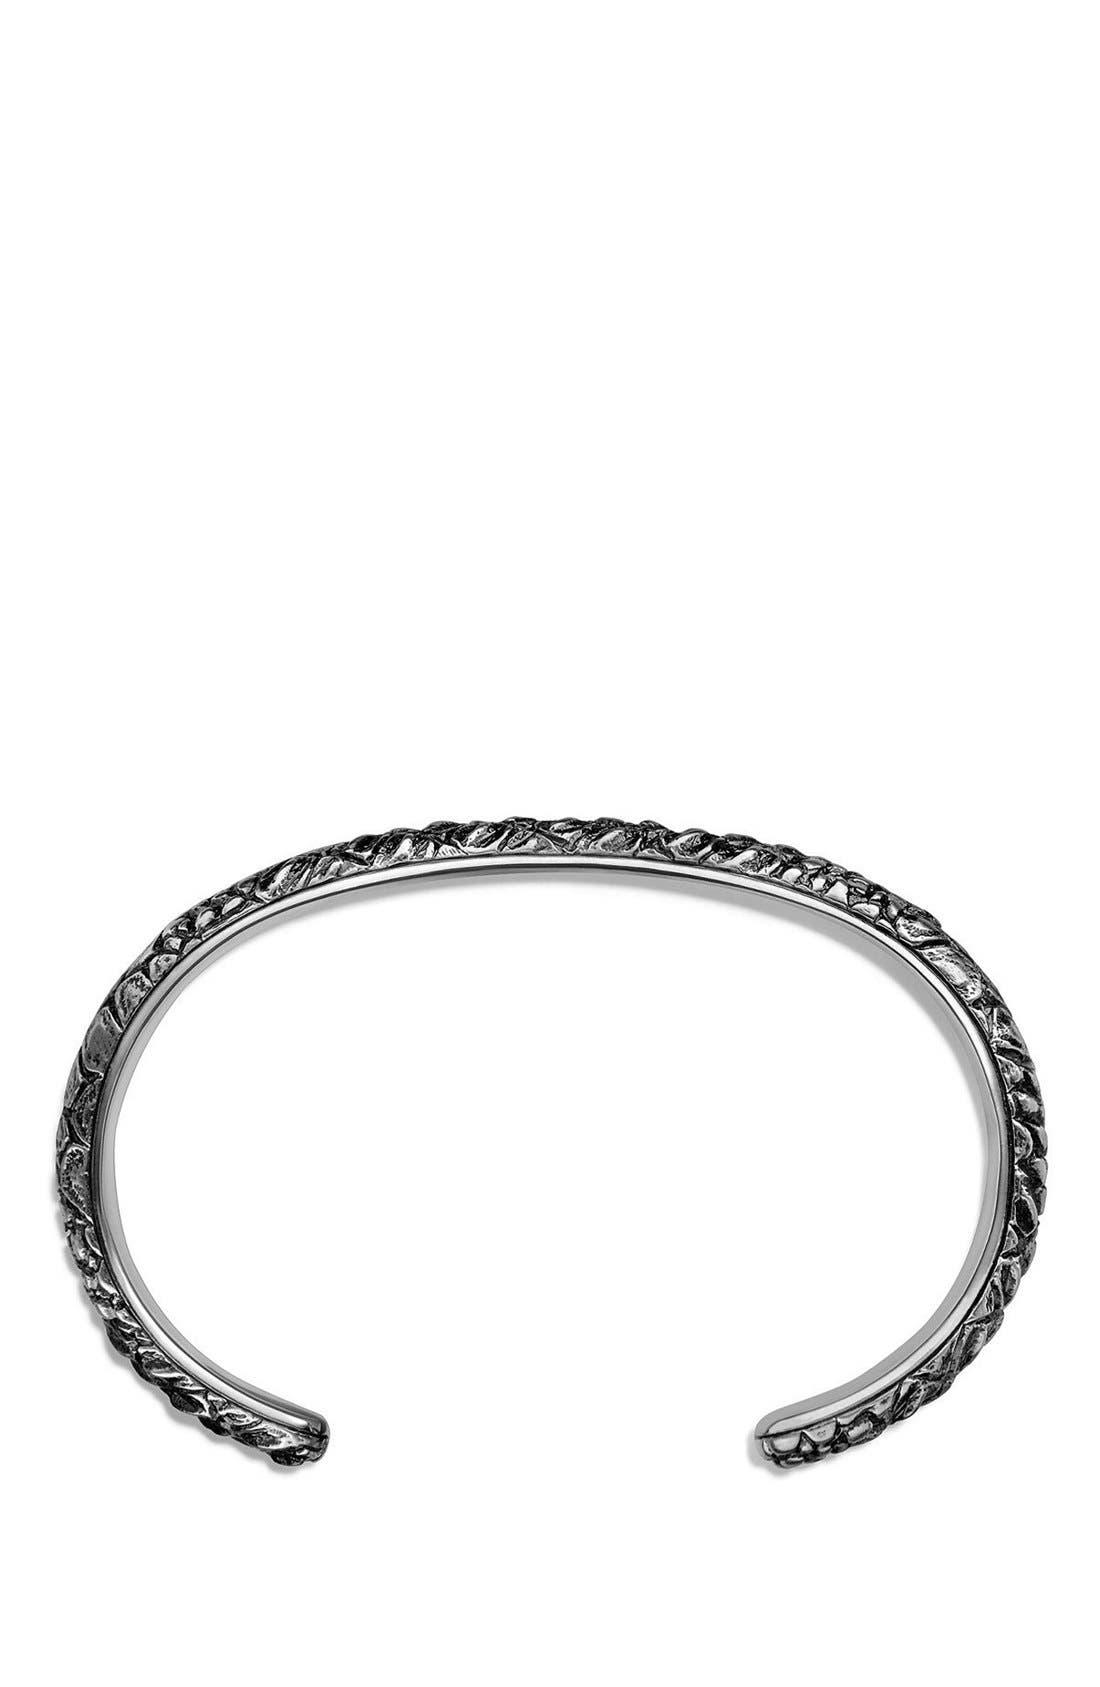 'Naturals' Gator Cuff Bracelet,                             Alternate thumbnail 2, color,                             SILVER